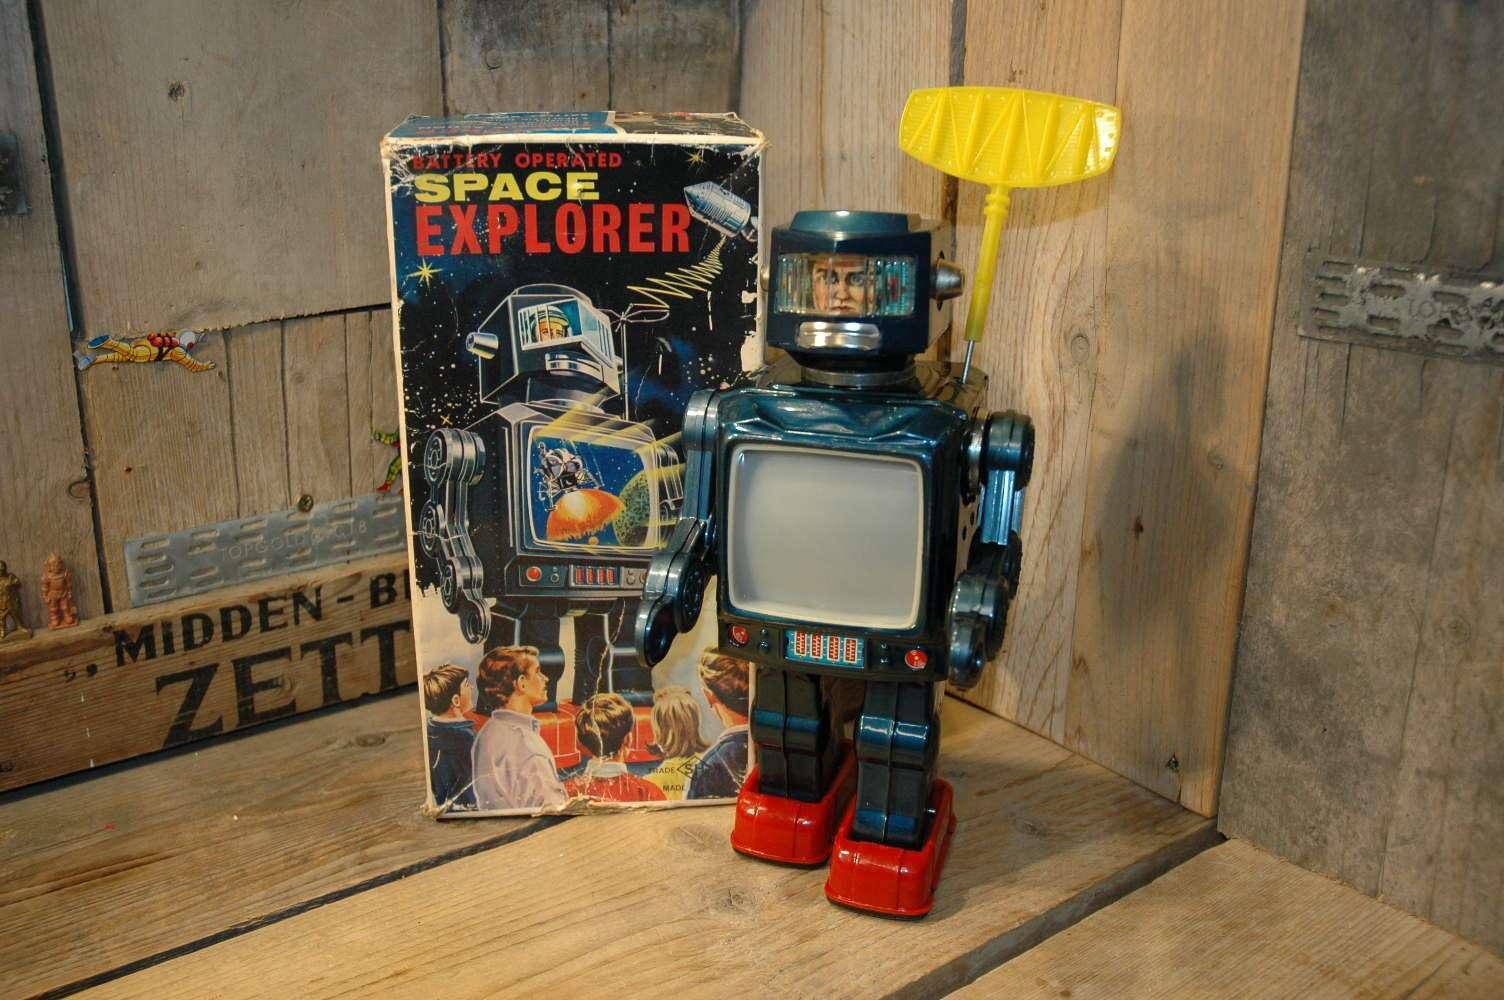 Horikawa SH - Space Explorer / Radar Robot